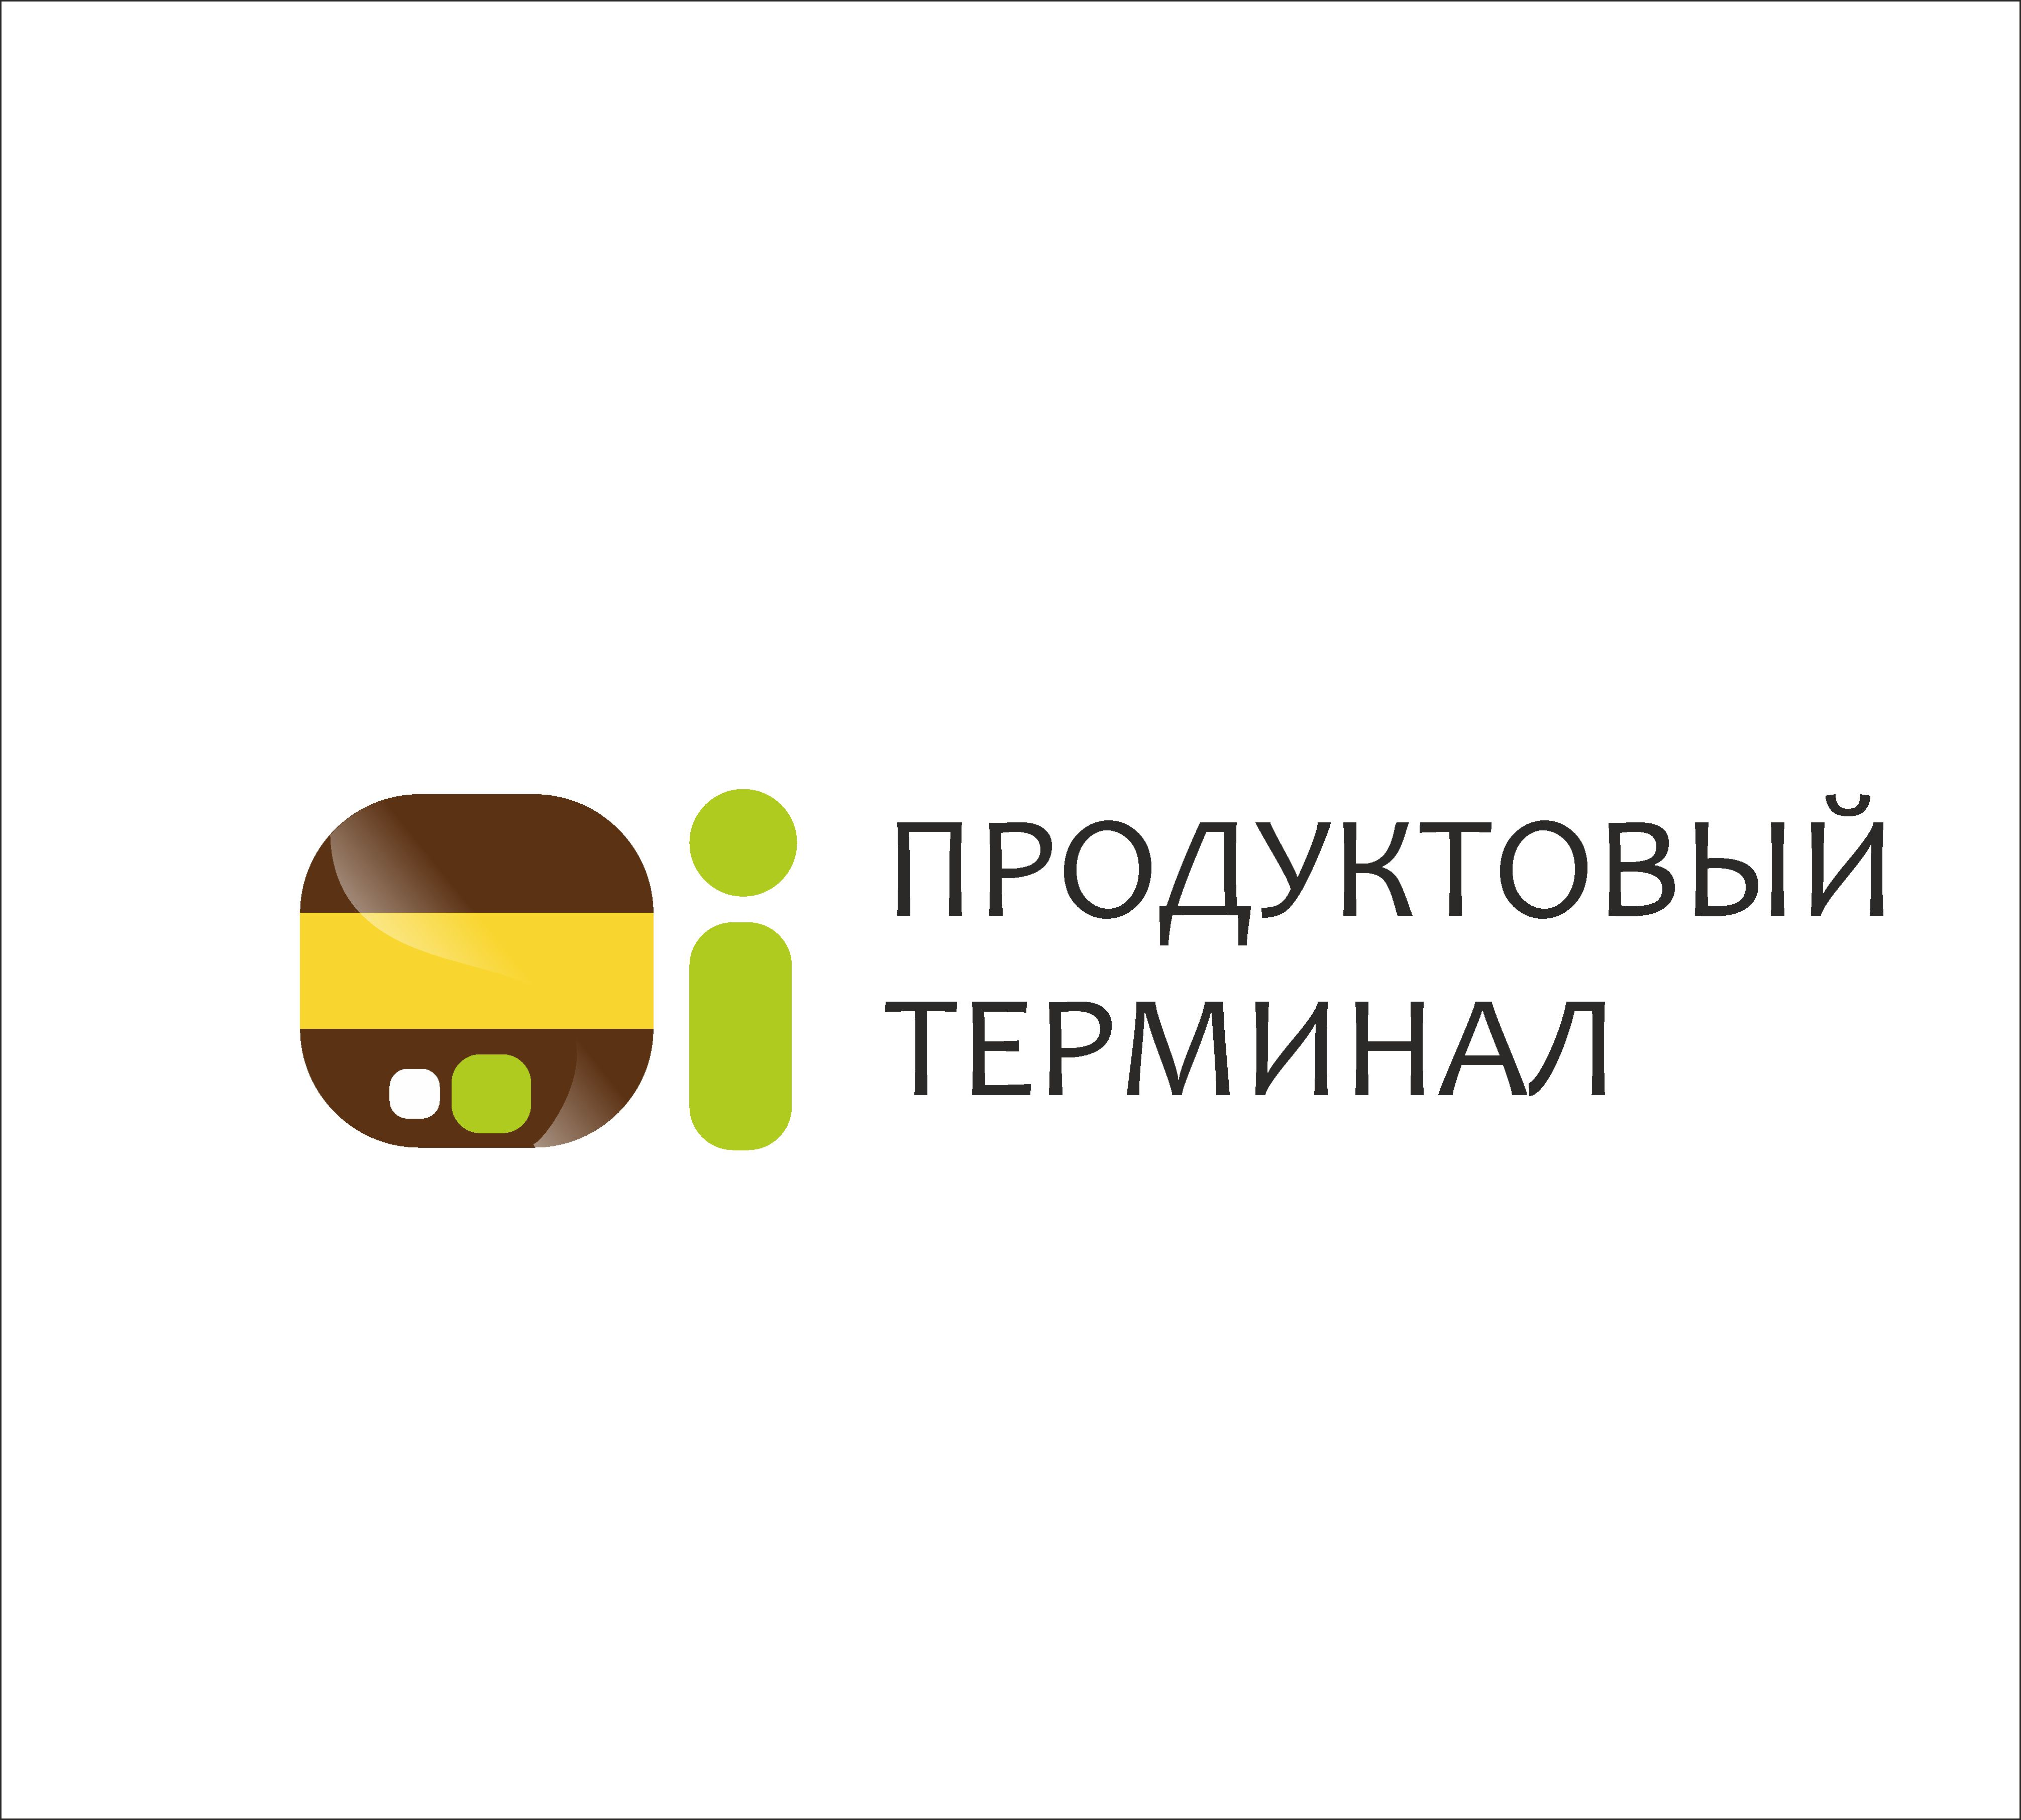 Логотип для сети продуктовых магазинов фото f_56556fa3e62bc30b.jpg